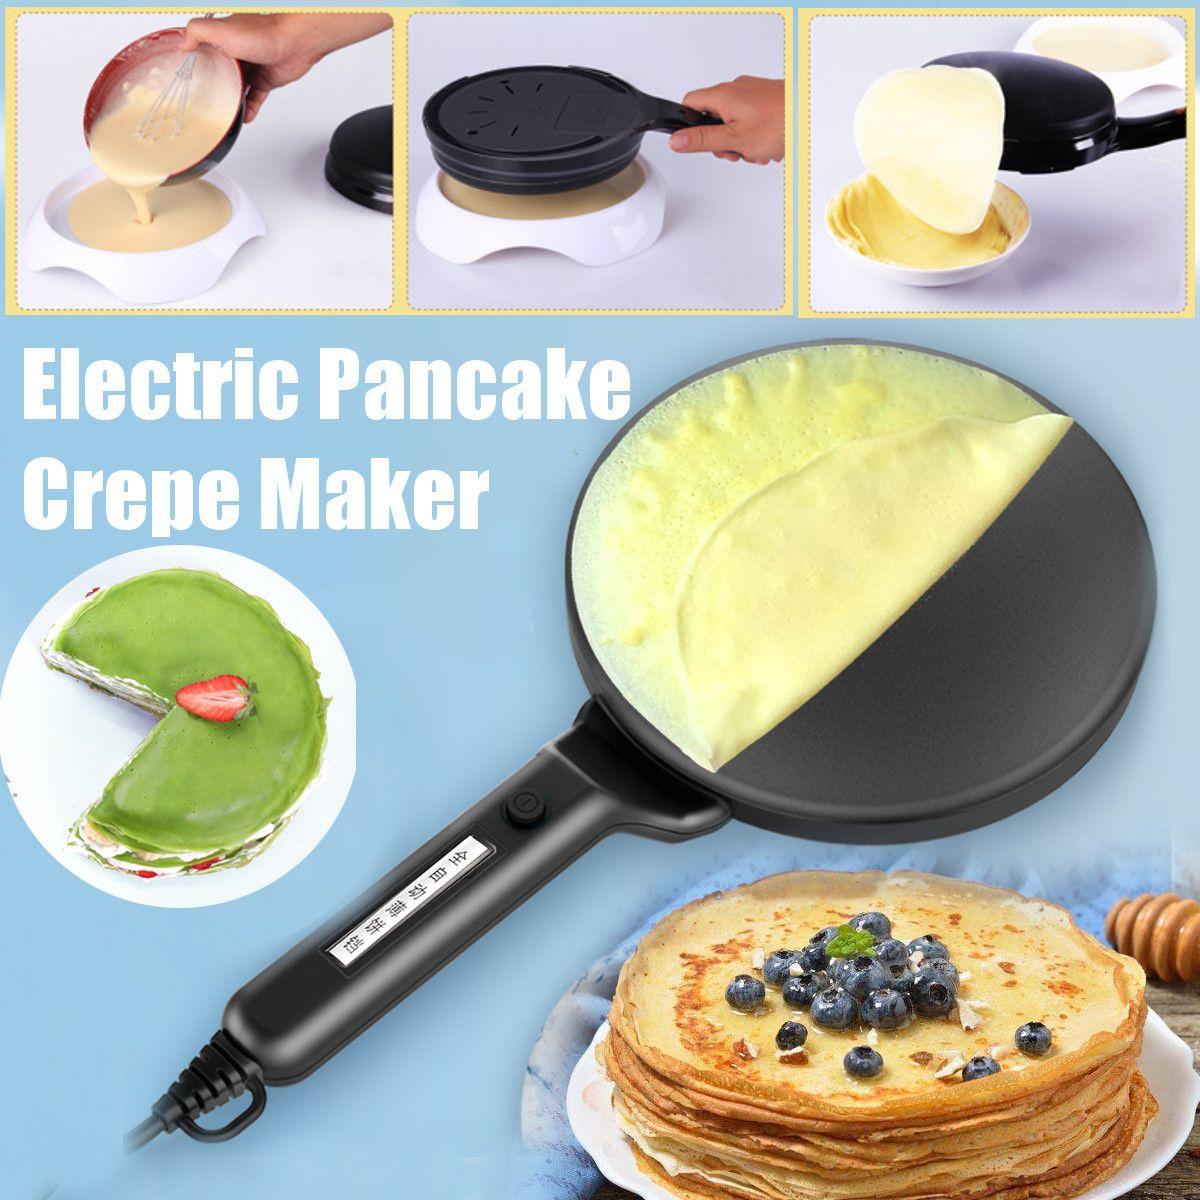 3Pcs/Set Non-stick Electric Crepe Pizza Maker Pancake Machine 220V Griddle Baking Pan Cake Machine Kitchen Cooking Tools Crepe